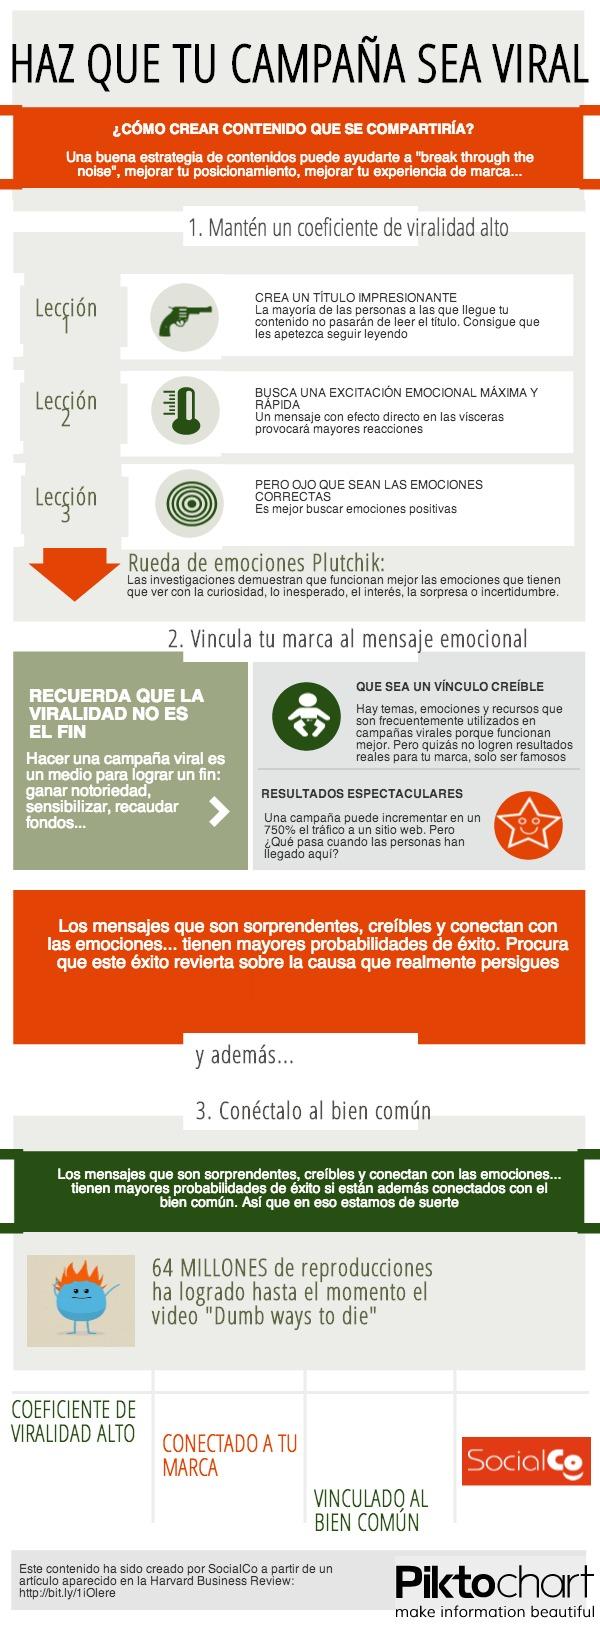 Infografía sobre campañas virales